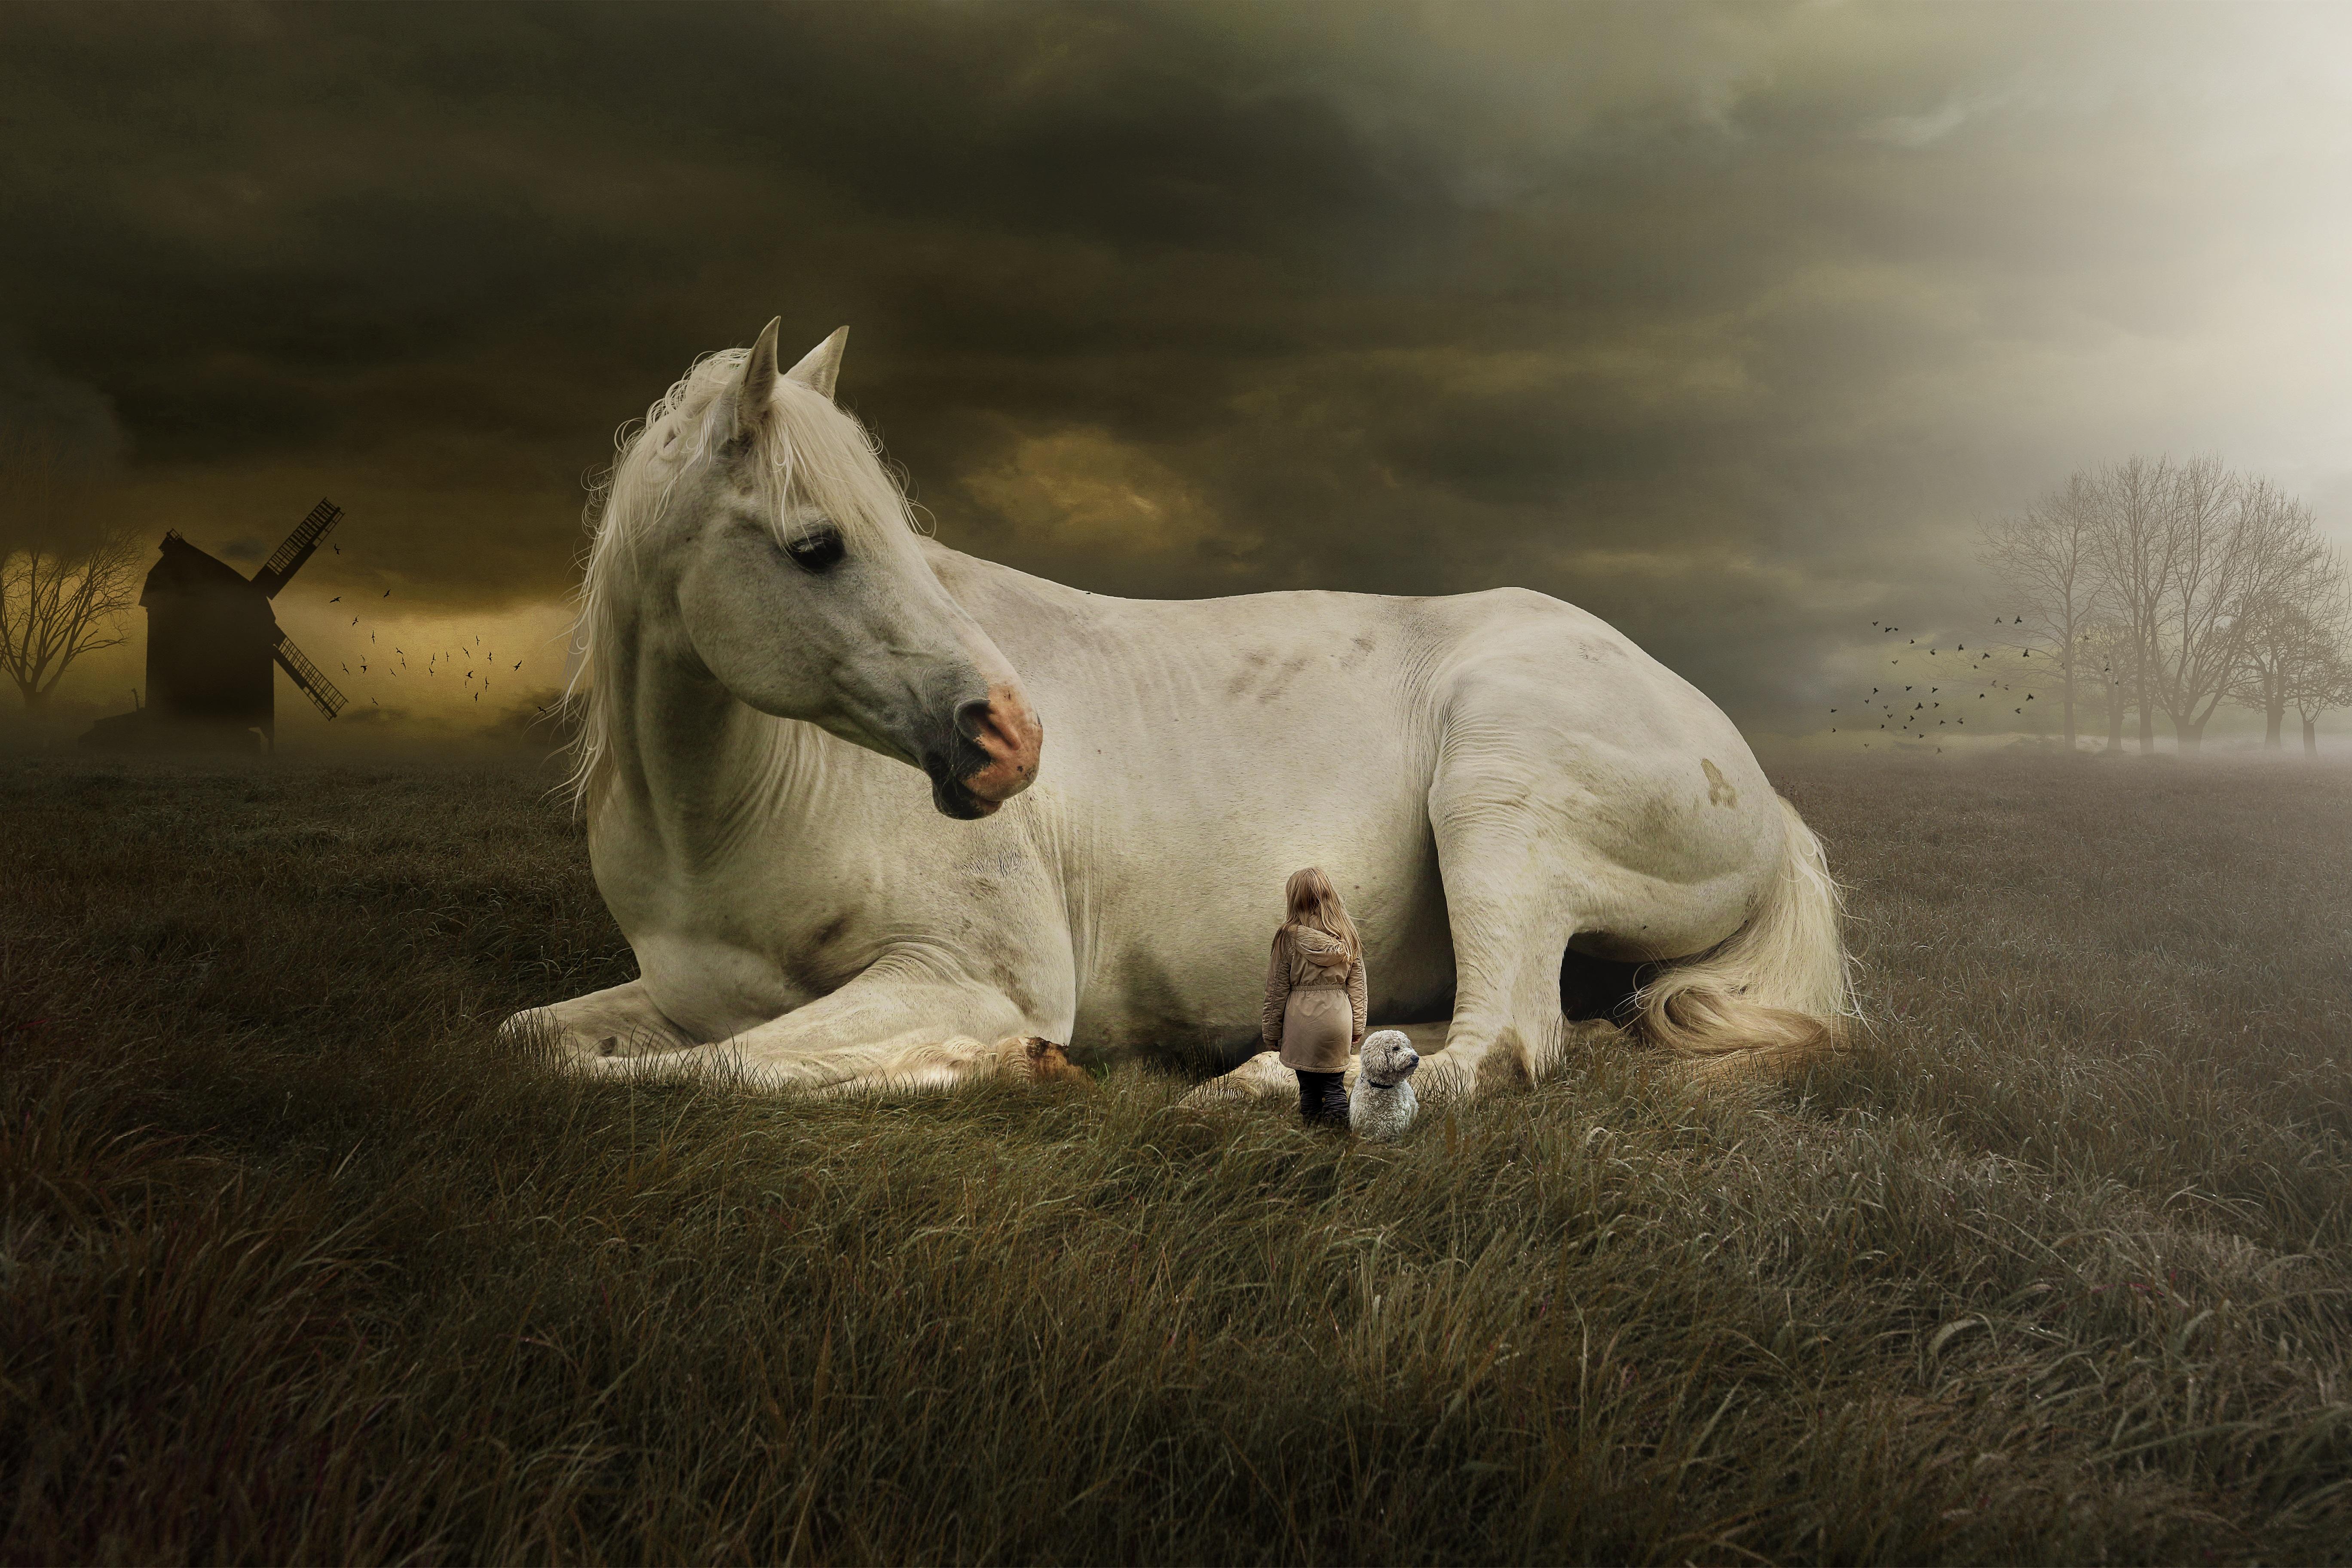 White Horse Laying Down 5472x3648 Wallpaper Teahub Io